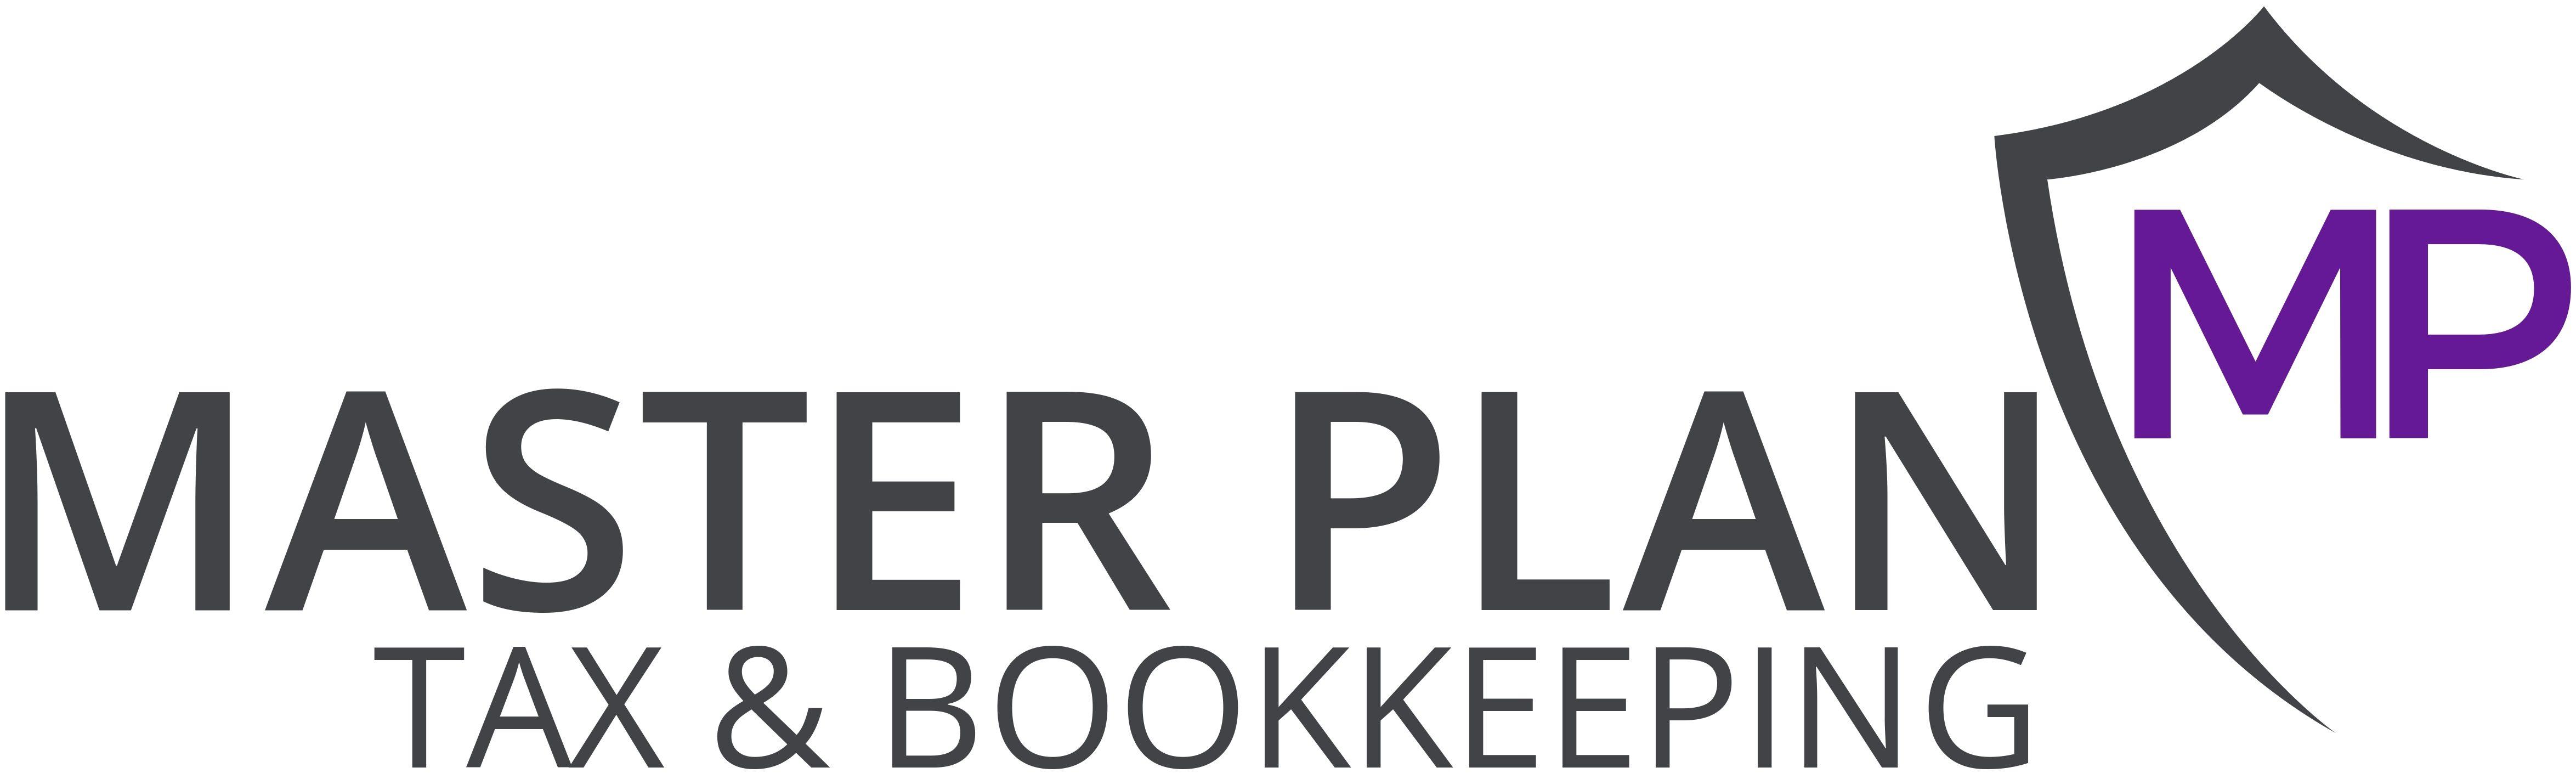 Master Plan Tax & Bookkeeping